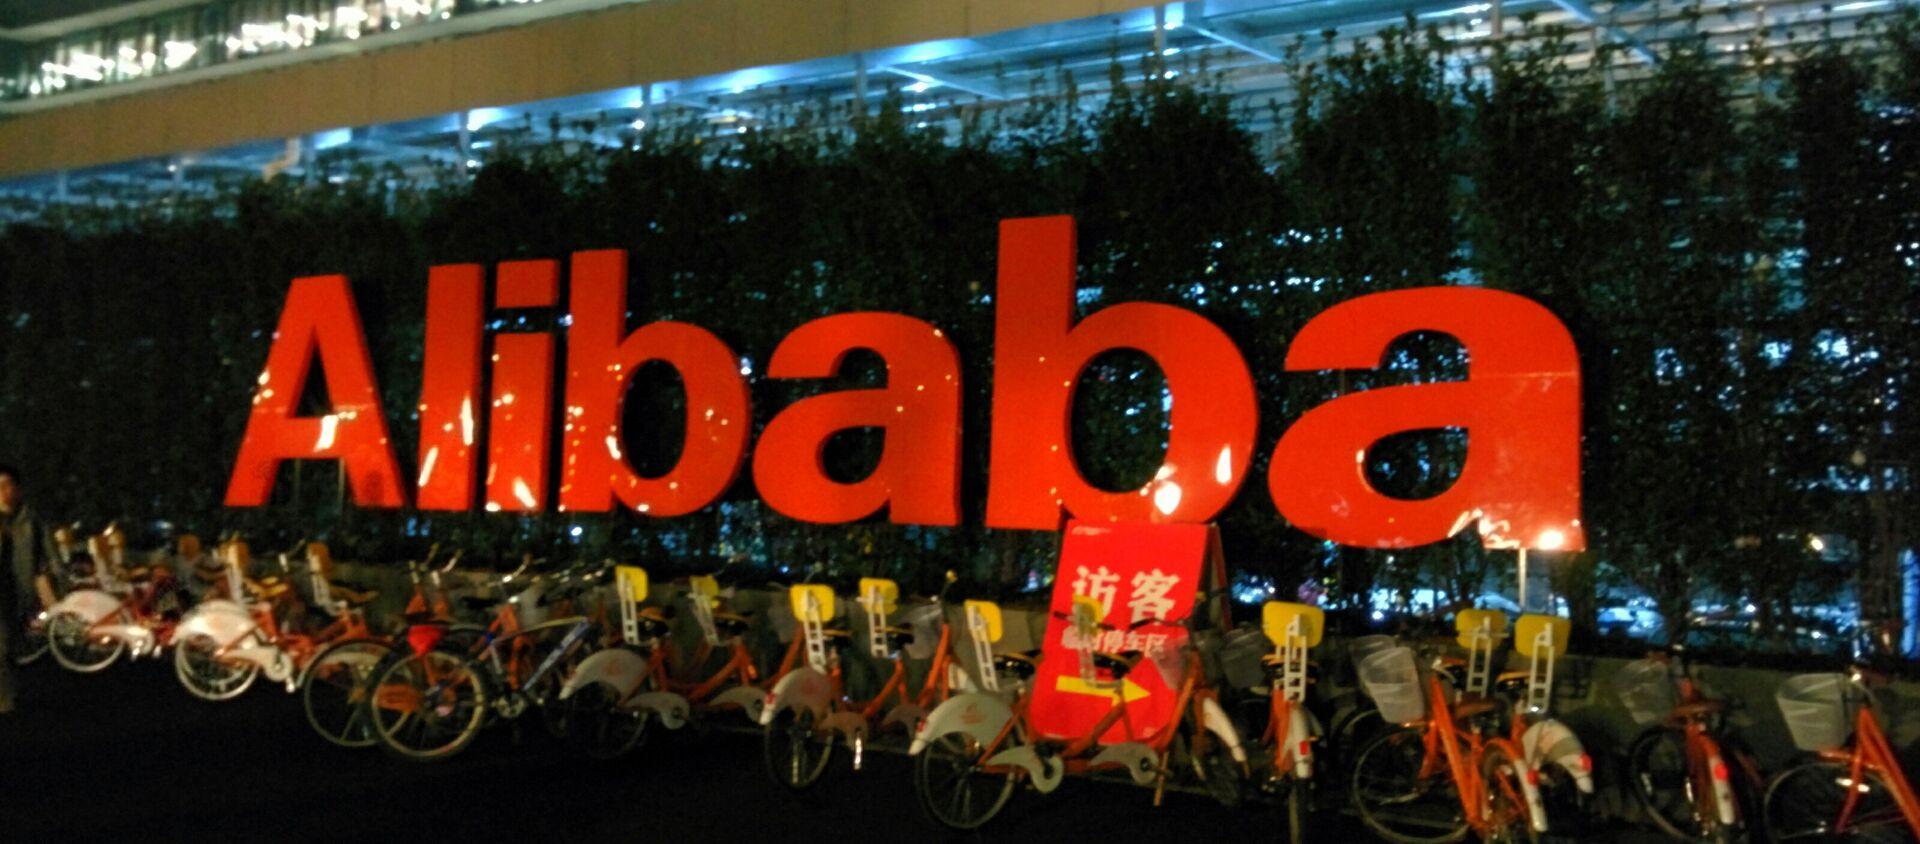 Alibaba - Sputnik Việt Nam, 1920, 25.12.2020